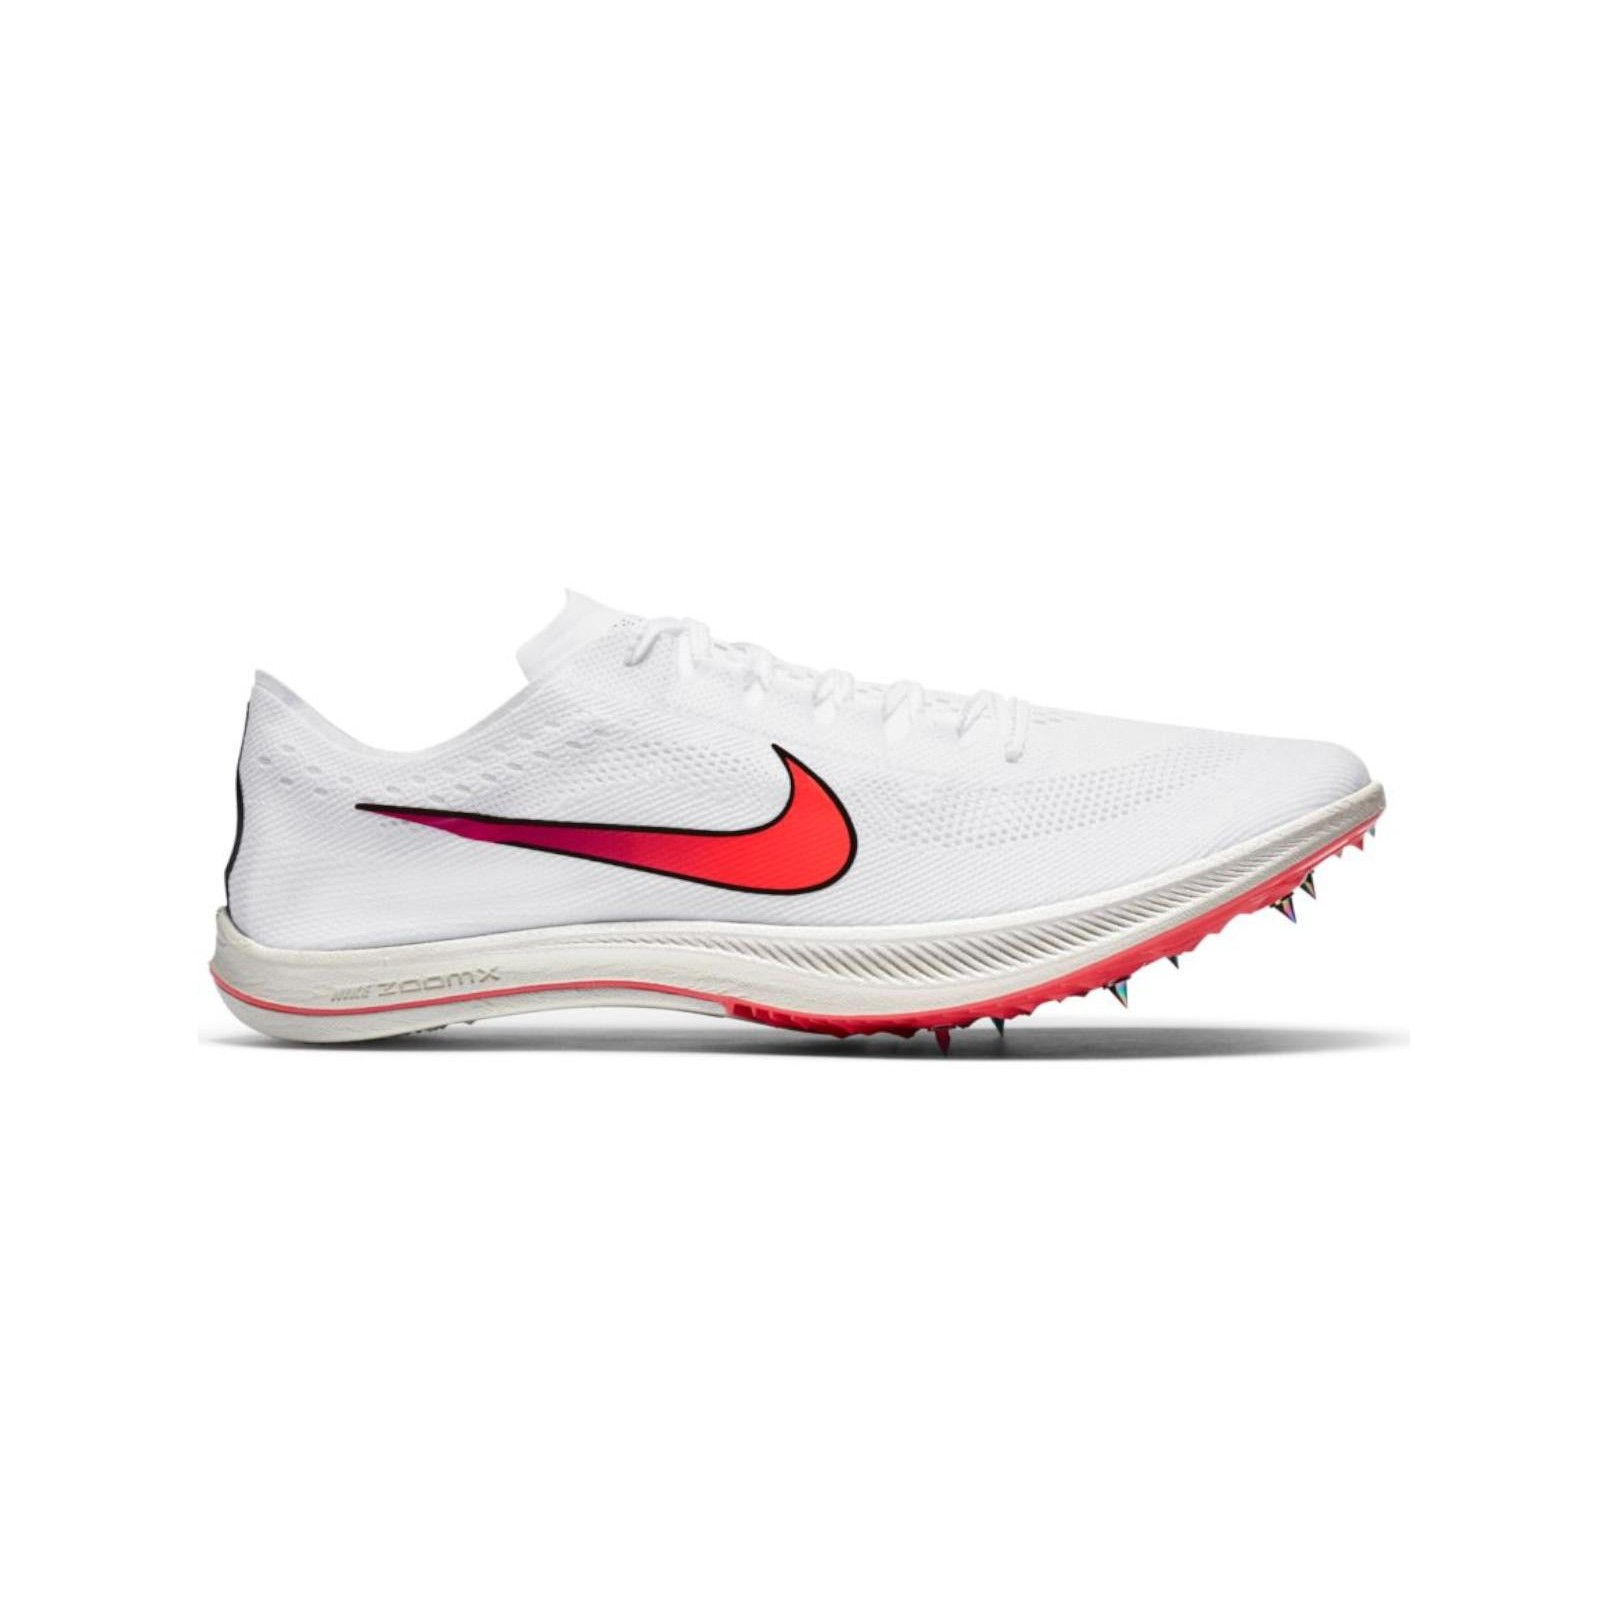 cuenca Reina Conejo  Nike-ZOOMX DRAGONFLY NIKCV0400100